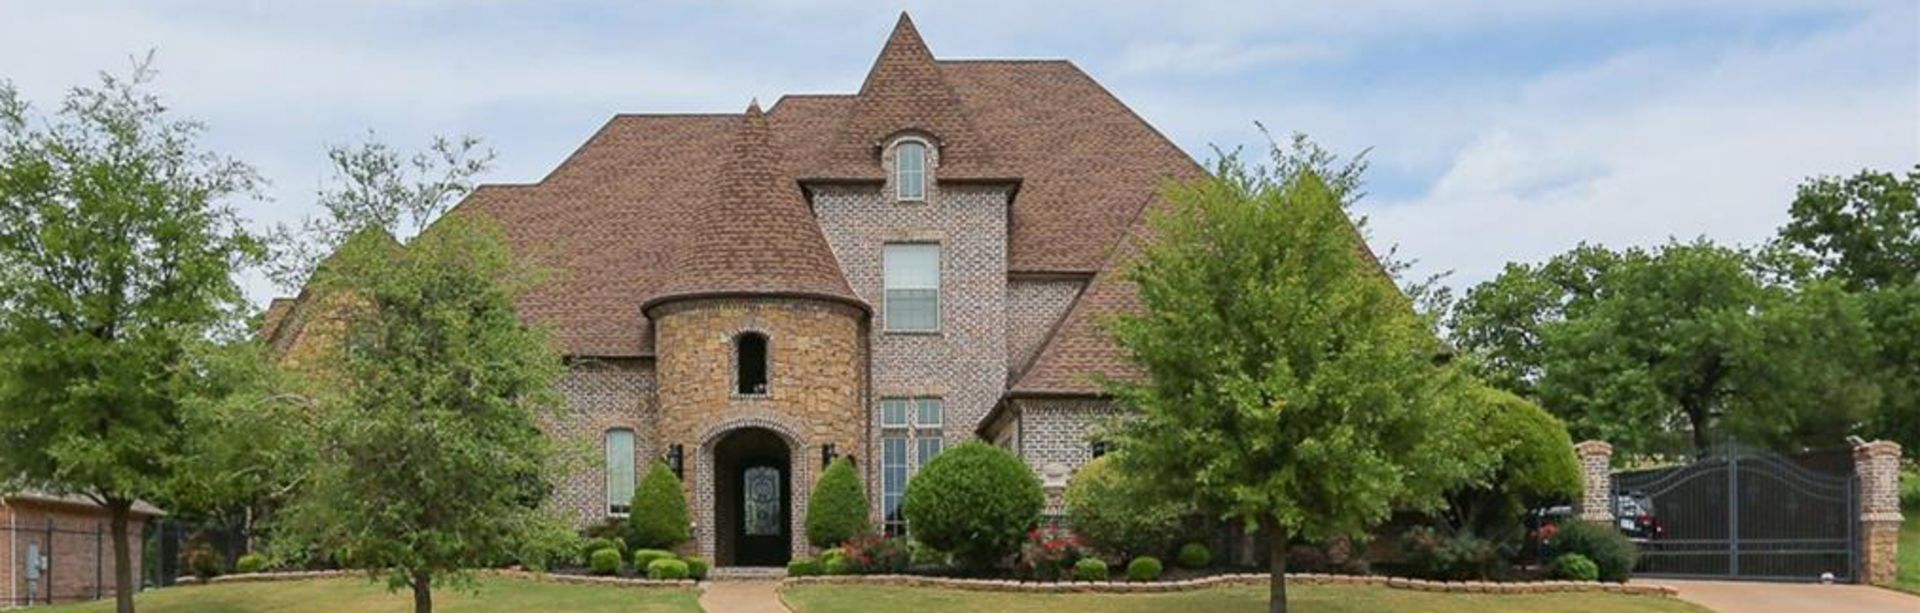 OPEN HOUSE THIS SATURDAY: 1113 Venetian St. Keller, TX 76248